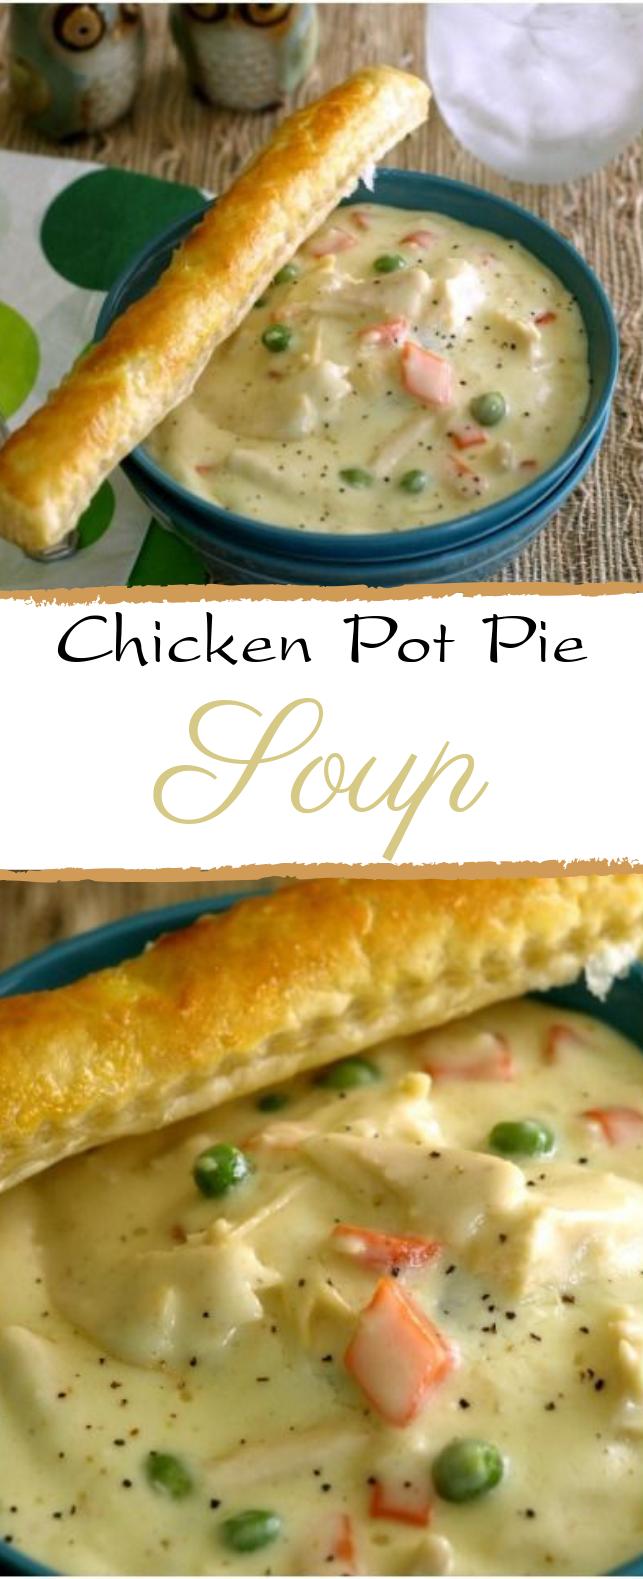 Chicken Pot Pie Soup #dinner #soup